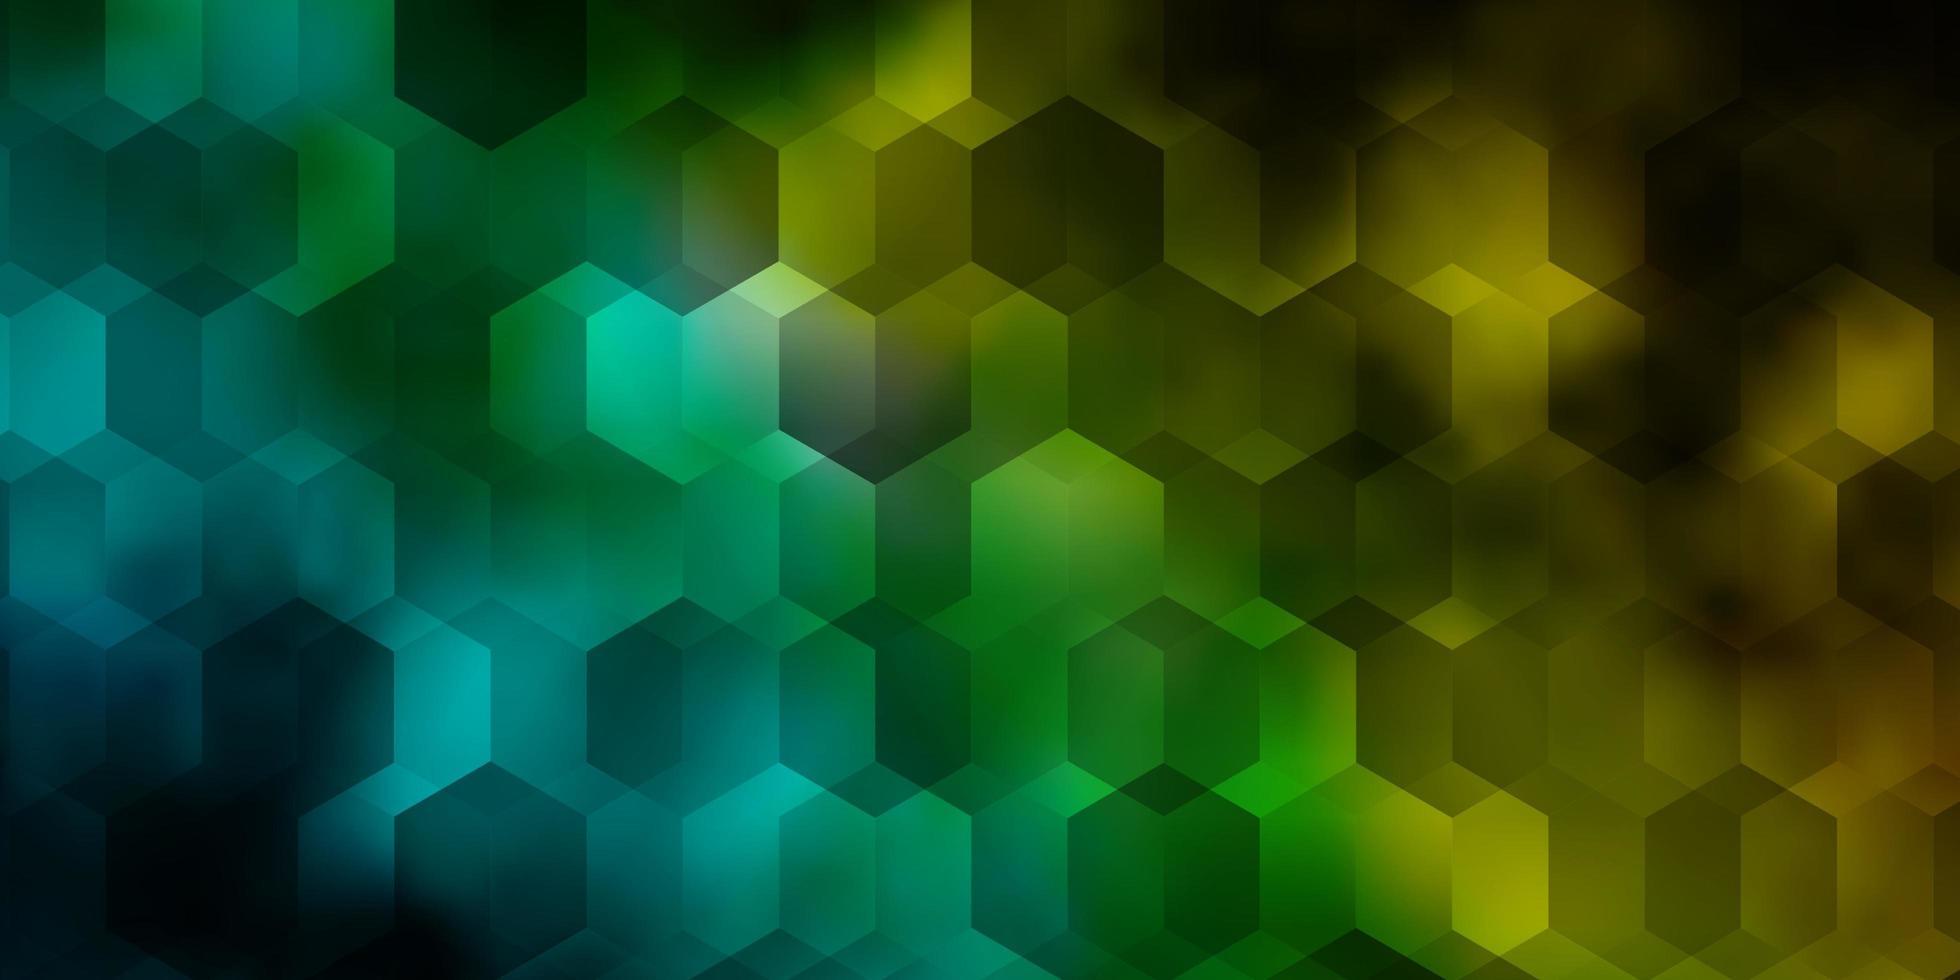 hellblaue, grüne Vektorschablone im sechseckigen Stil. vektor